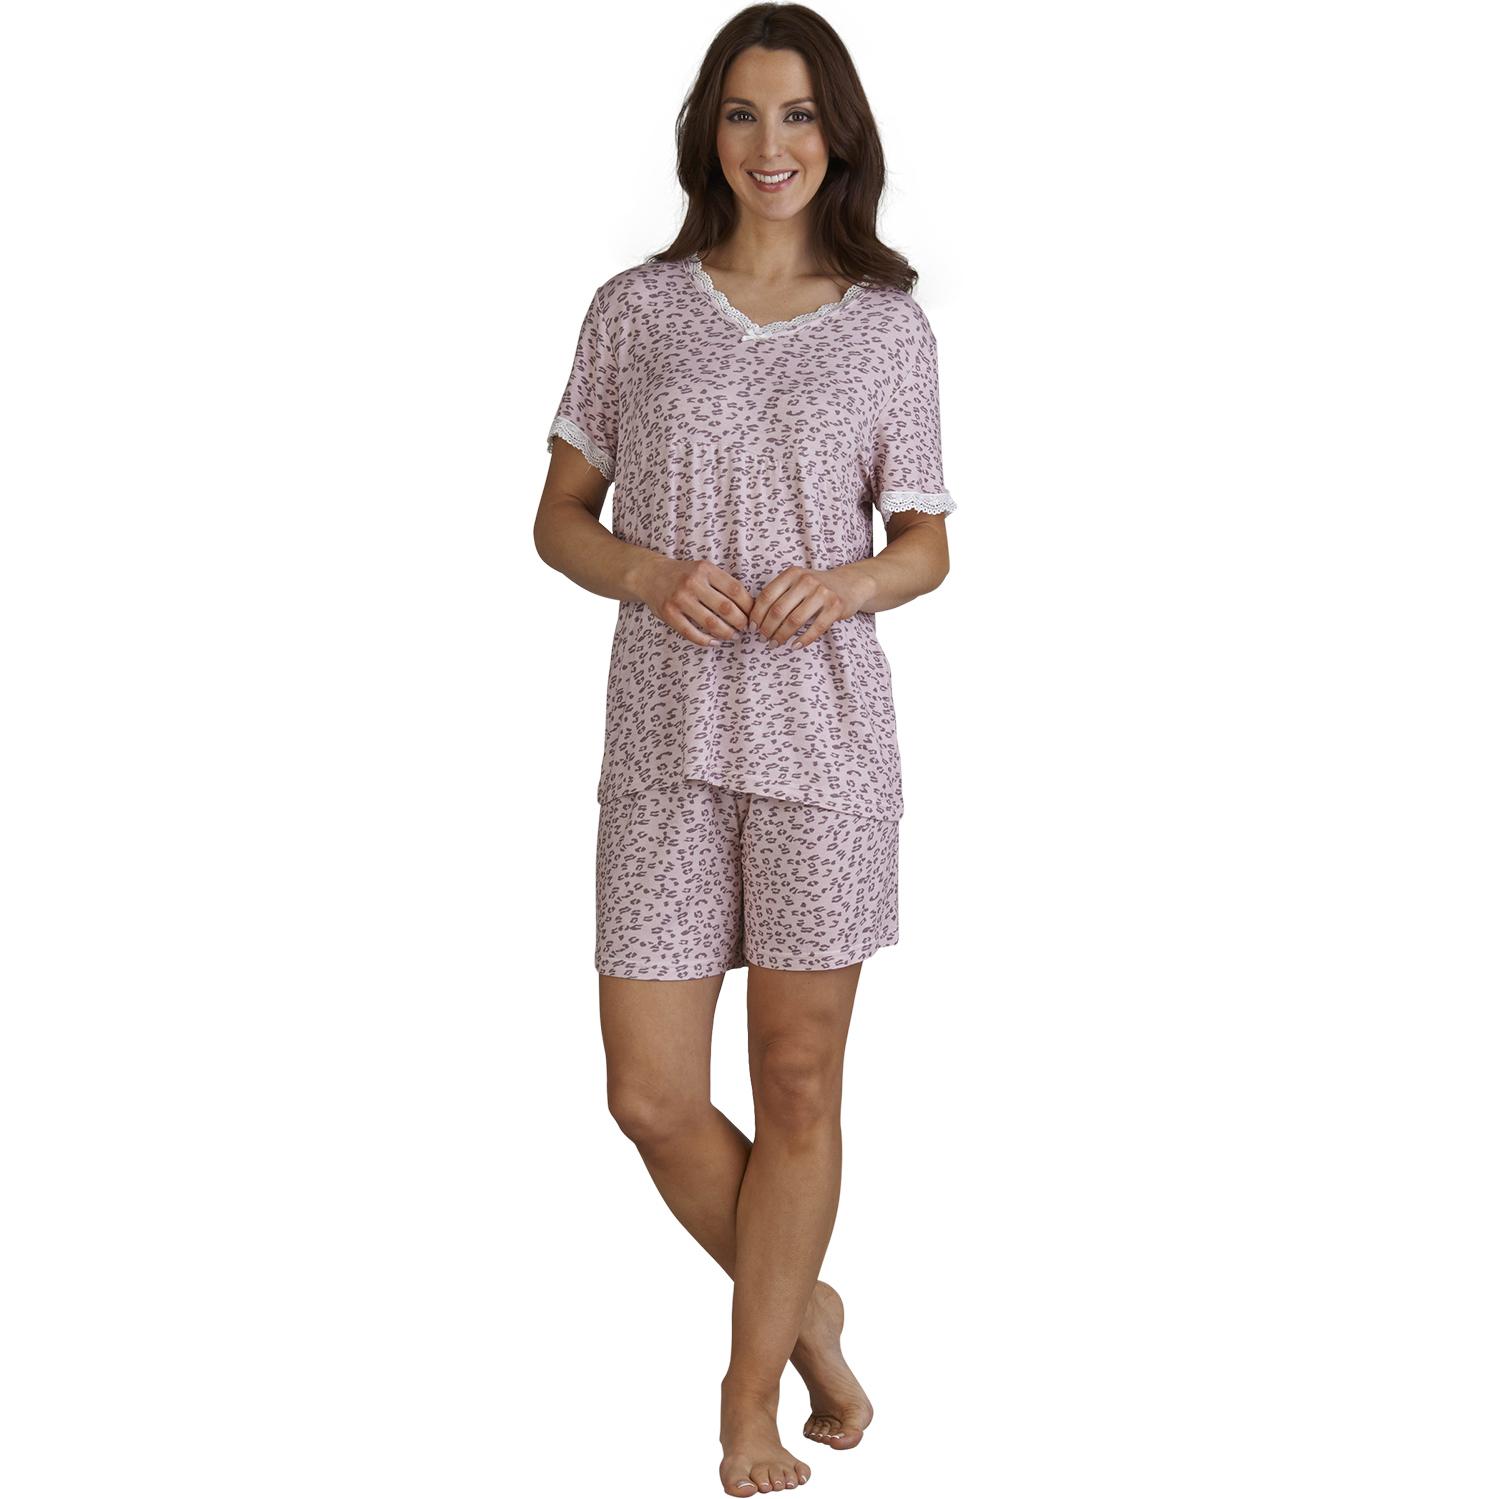 1a9cb69e6bc19 Slenderella Leopard Print Pyjamas Ladies T Shirt Shorts PJs Set Womens  Nightwear